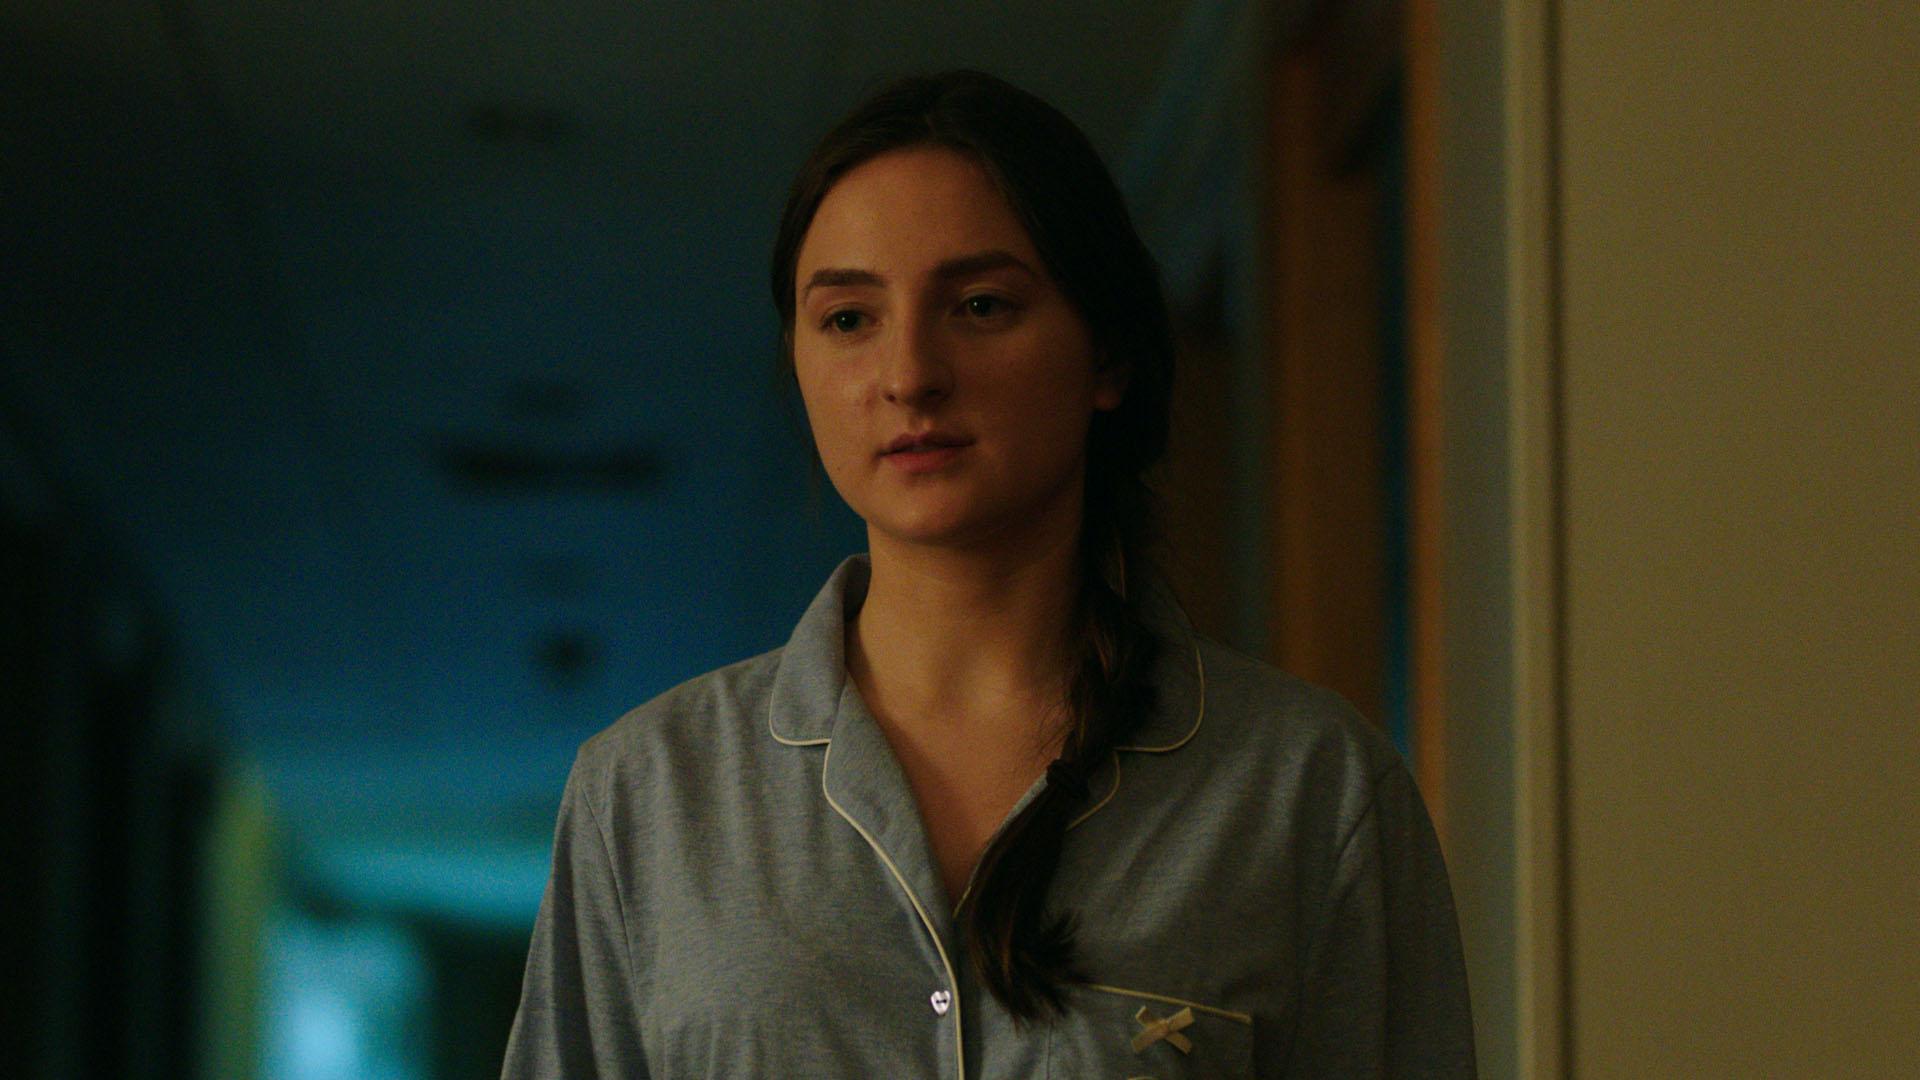 Image - S02E07 - Modus - (C) Miso Film Svenge AB (4)